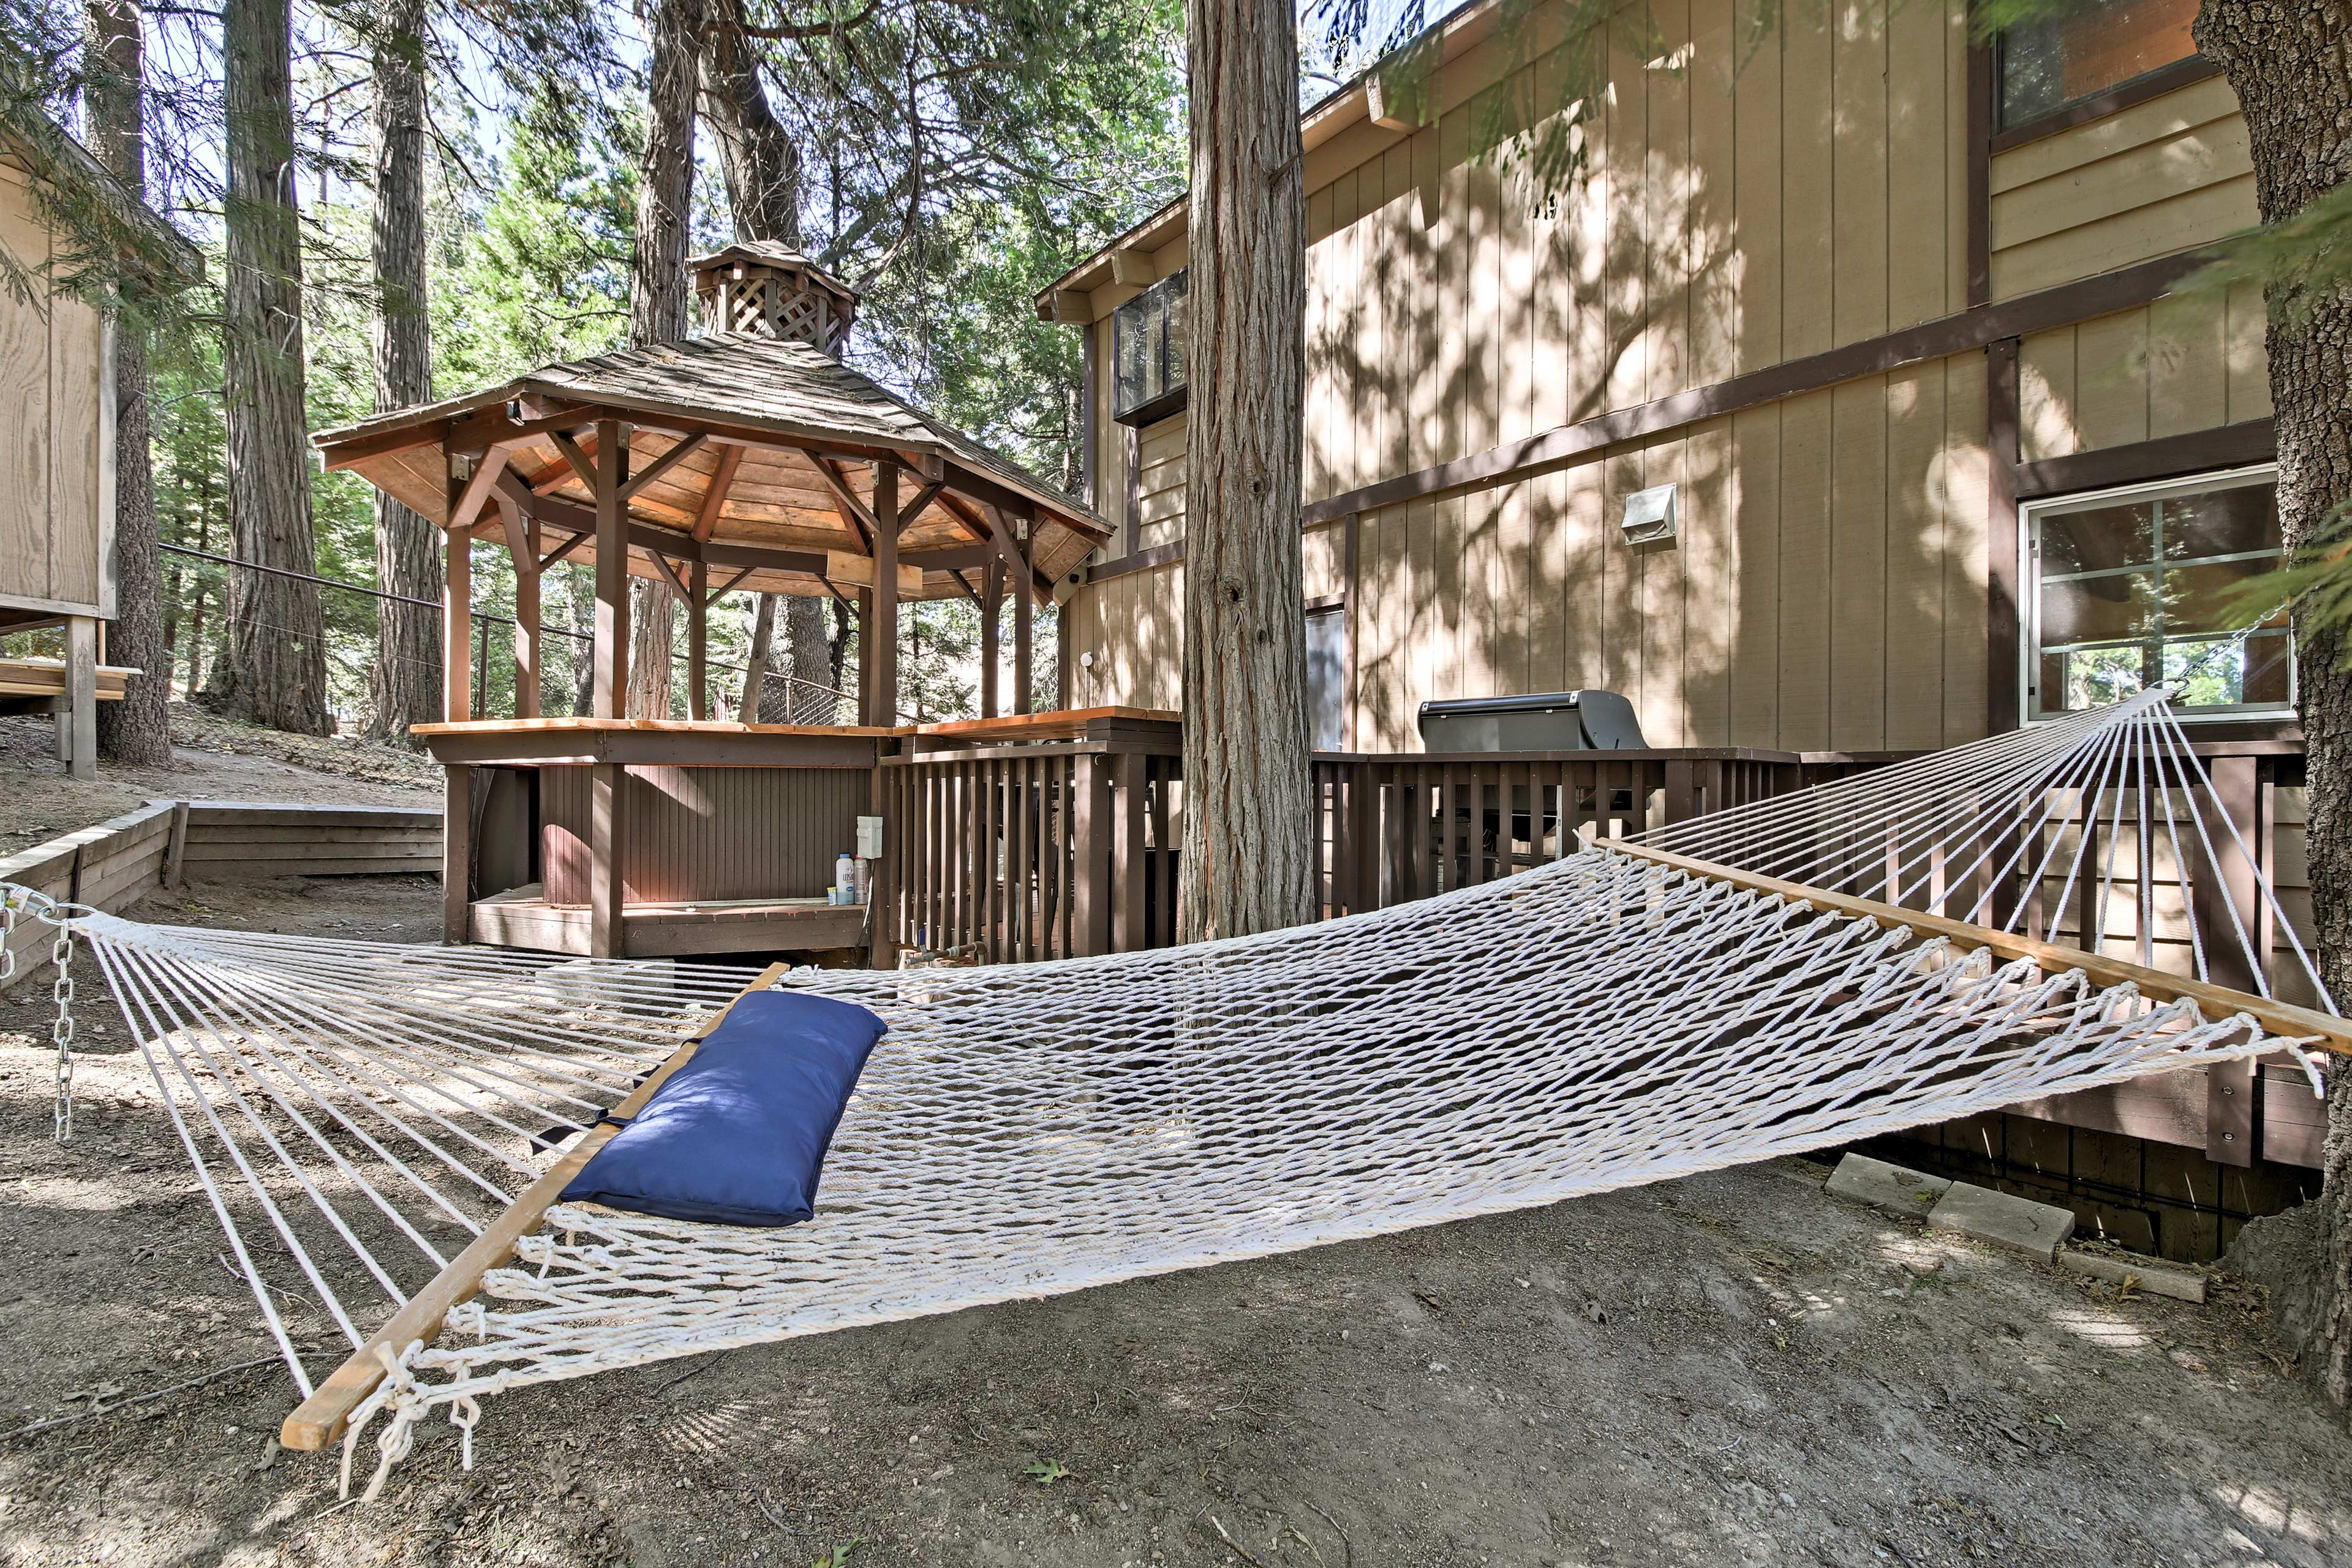 Recline on the hammock in the dappled sunlight.